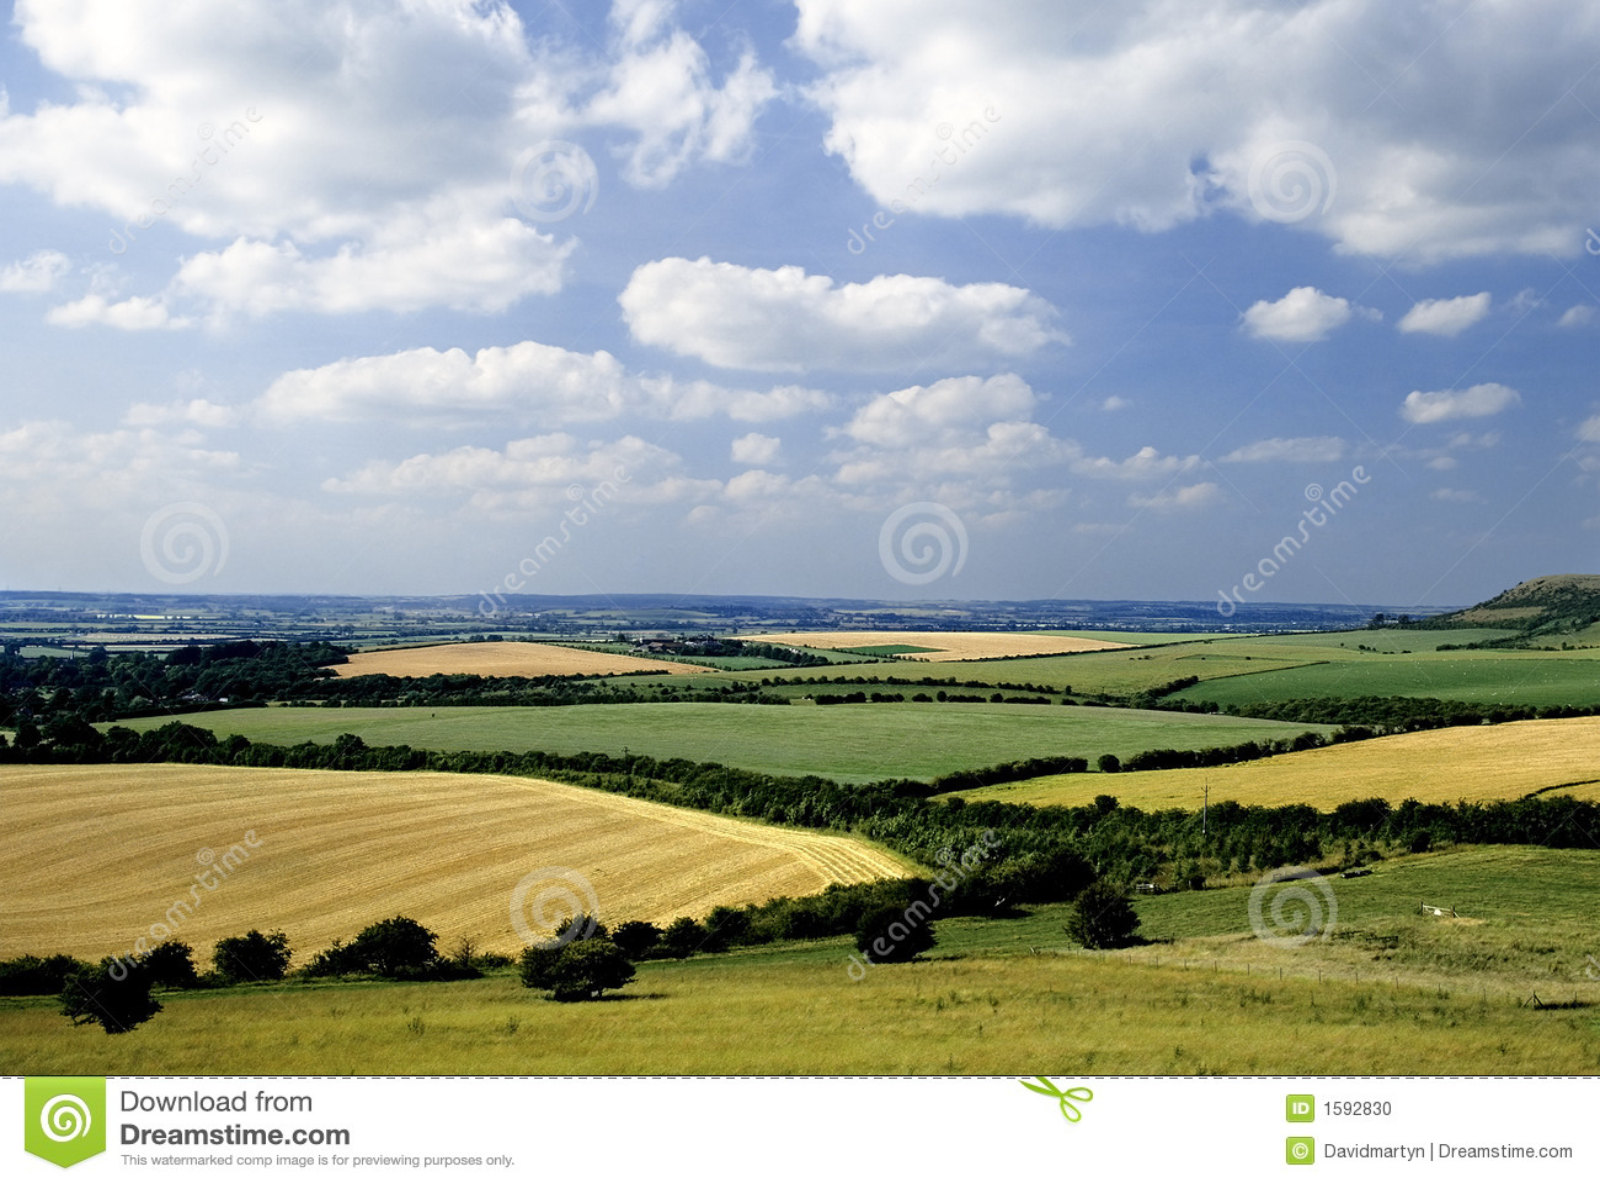 Rollende englische Landschaft